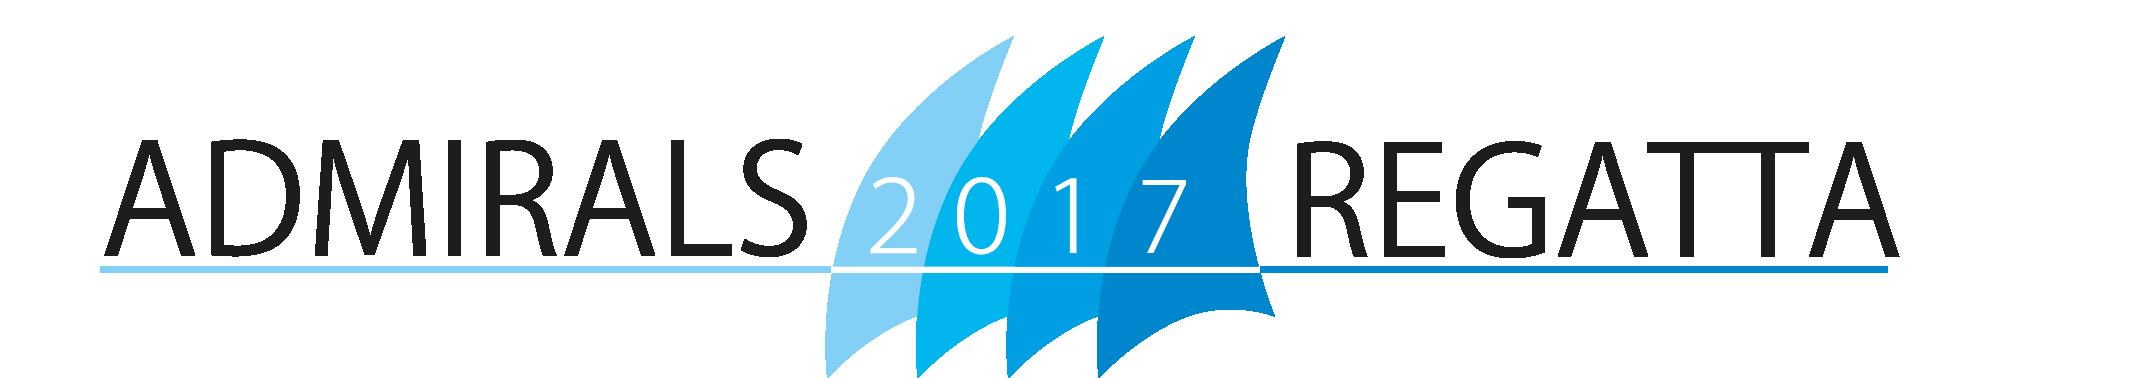 2017 log